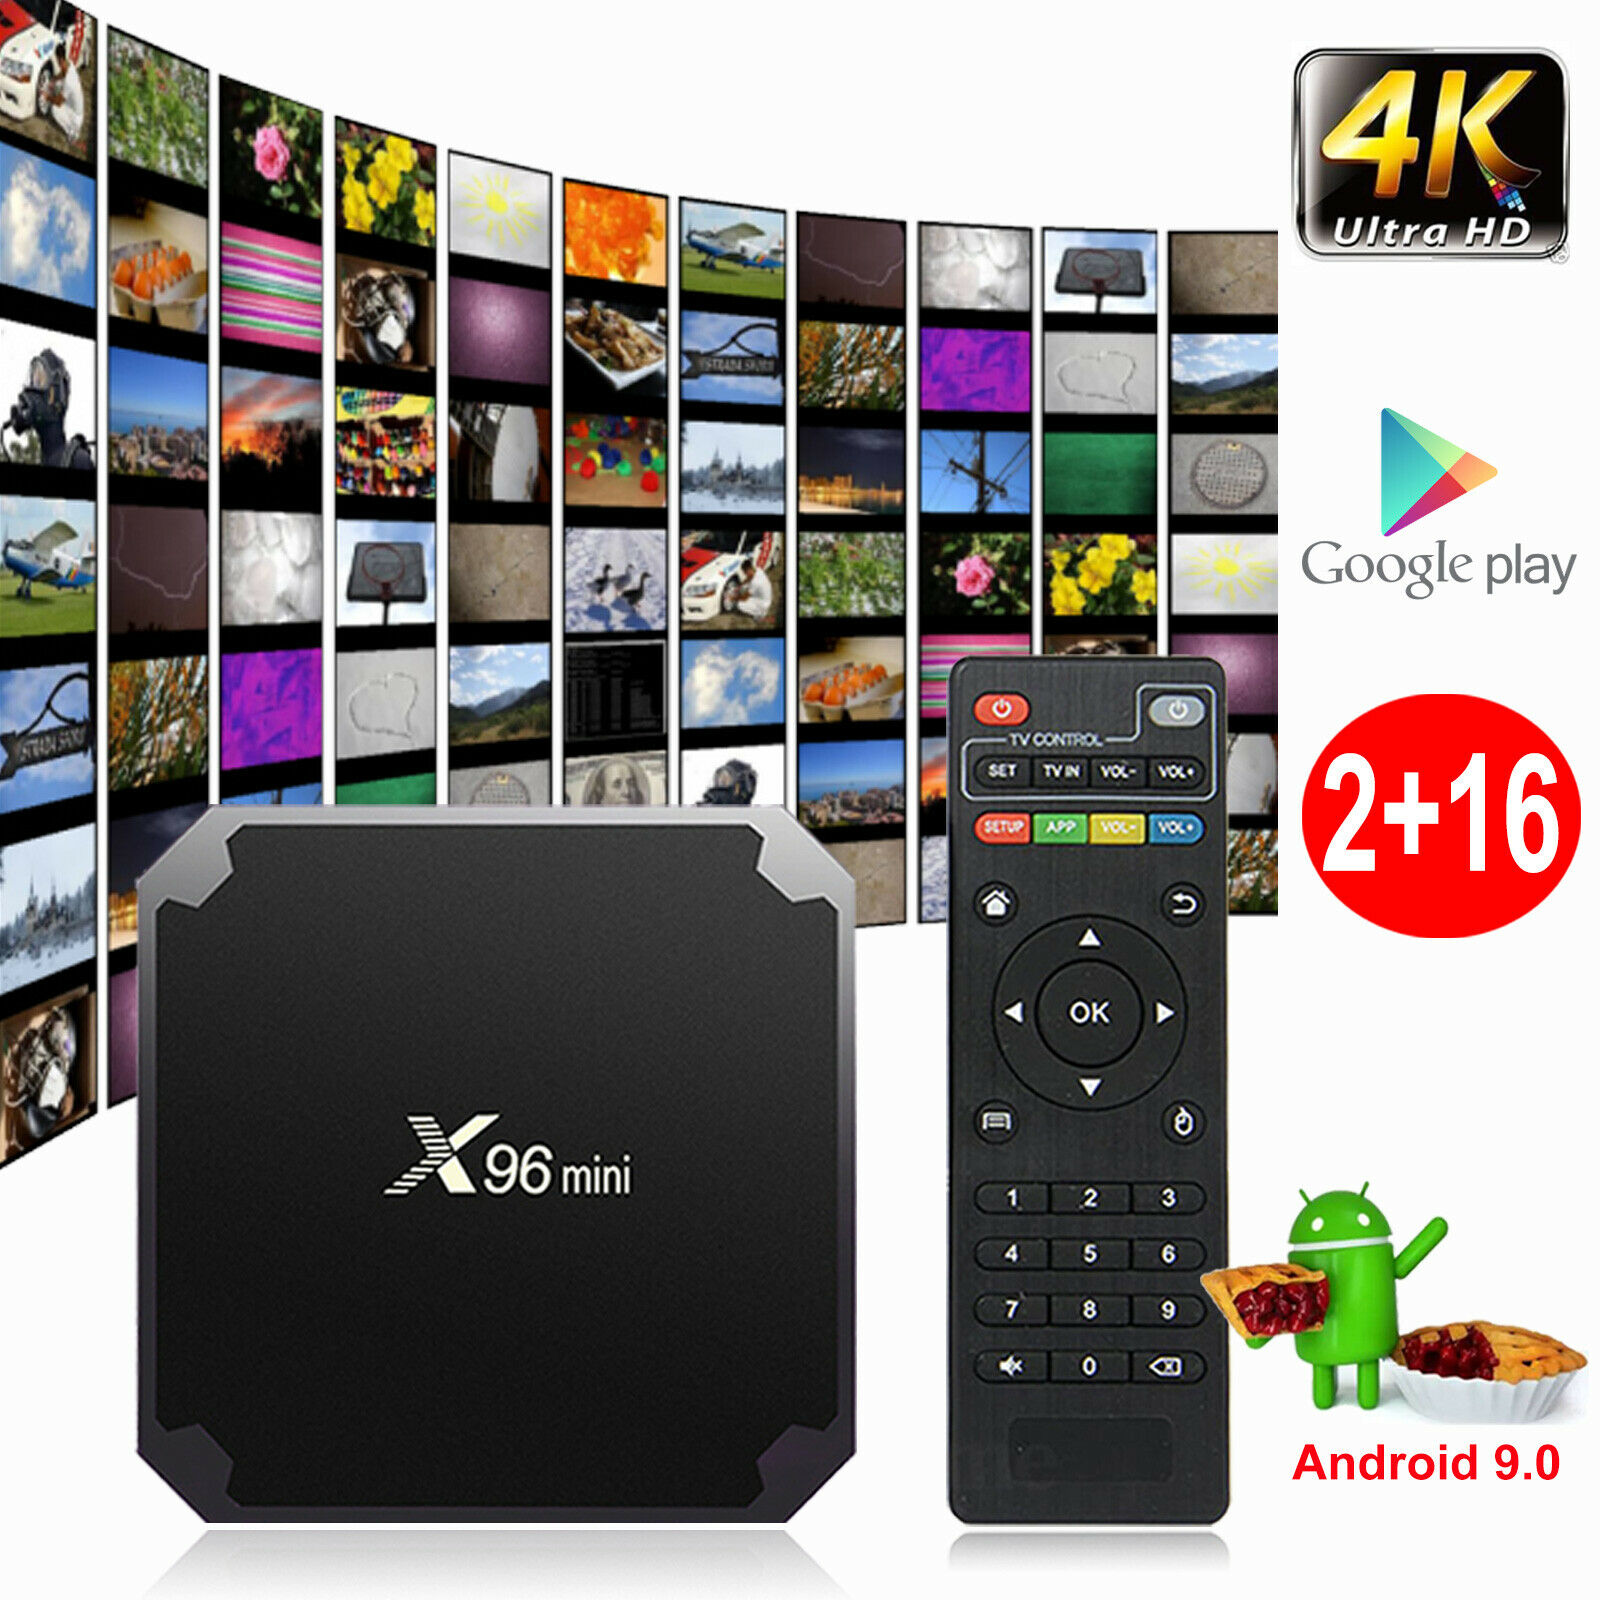 NEW X96 MINI 2+16 GB SMART TV BOX QUAD CORE 4K X96112 – Uncle Wiener's  Wholesale